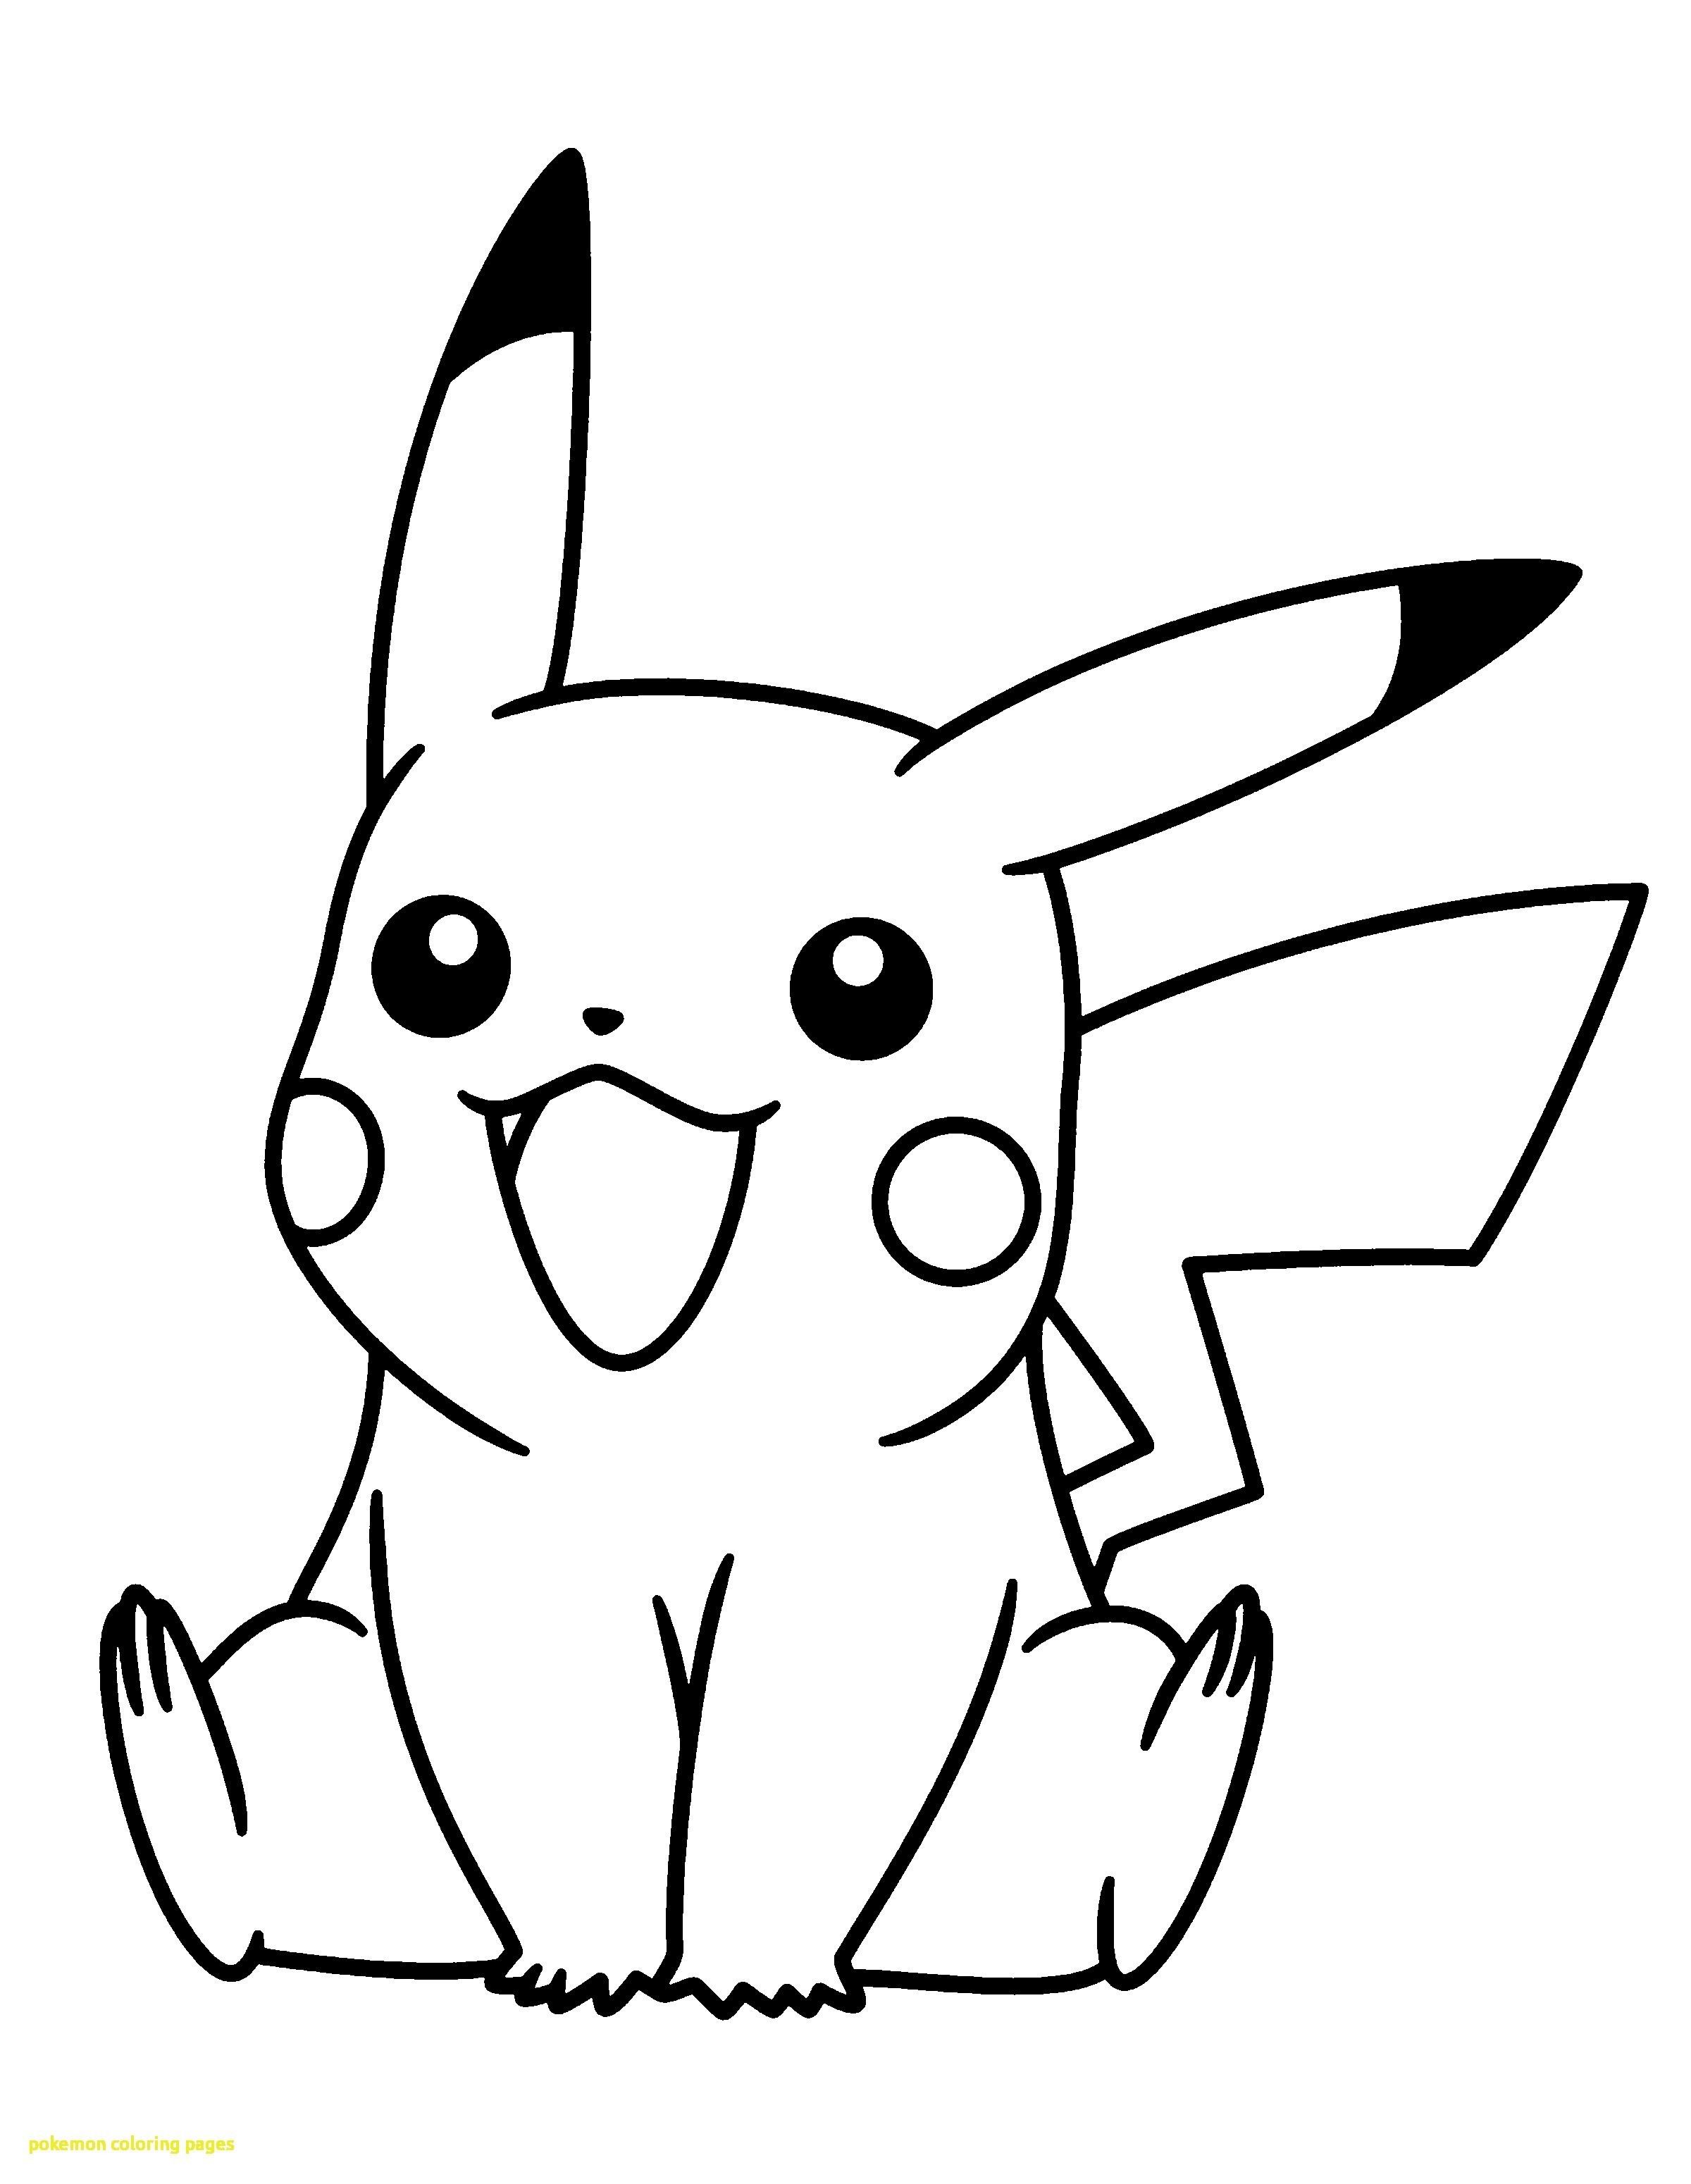 Free Printable Pokemon Coloring